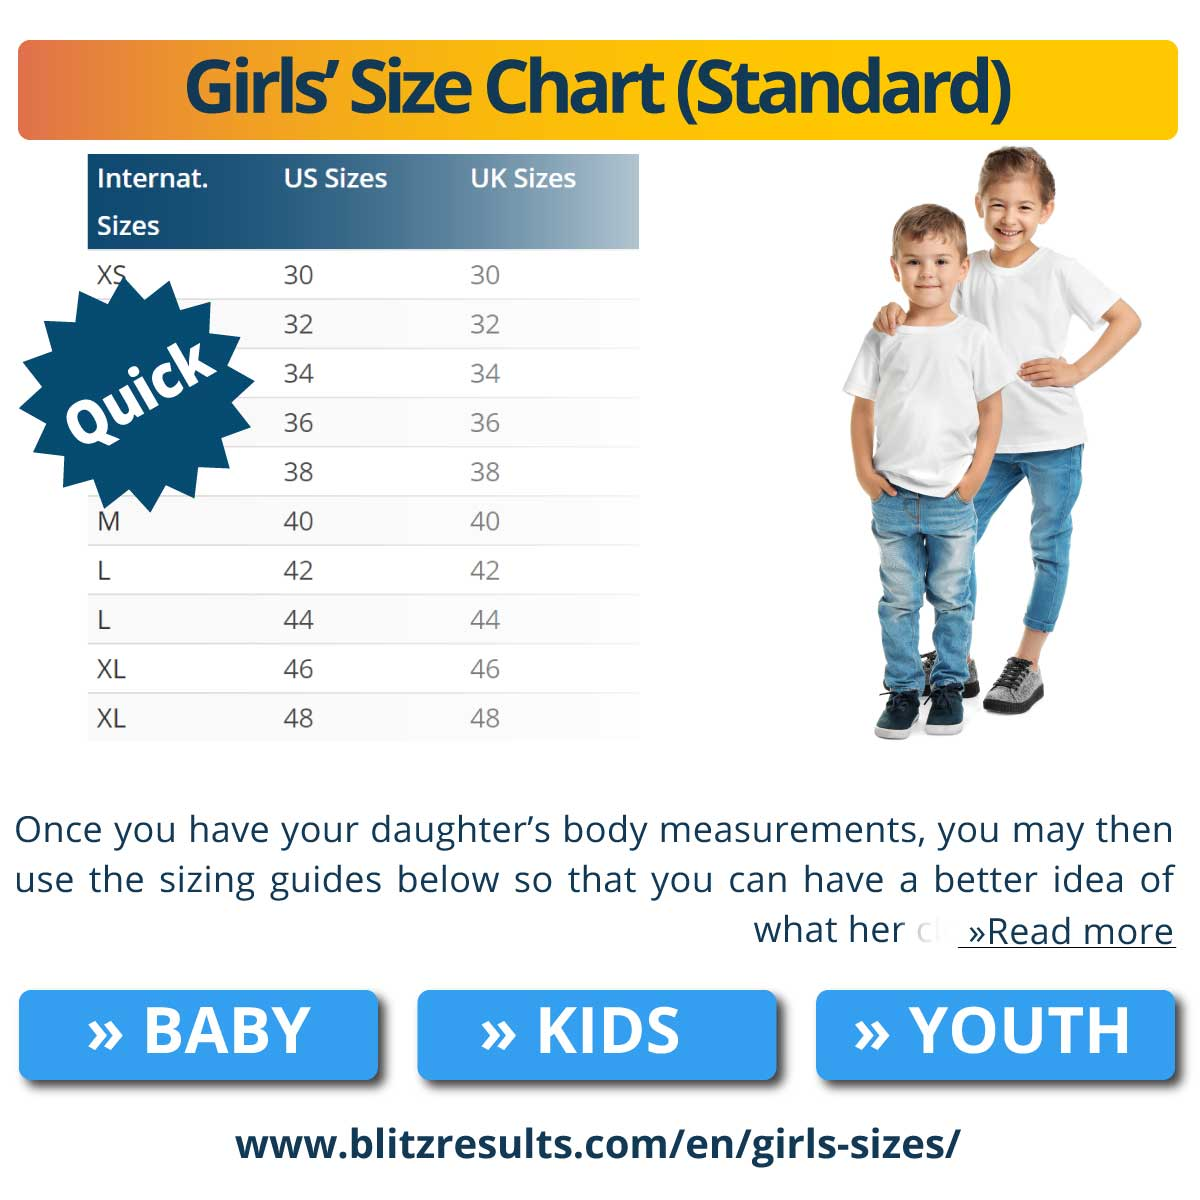 Girls' Size Chart (Standard)